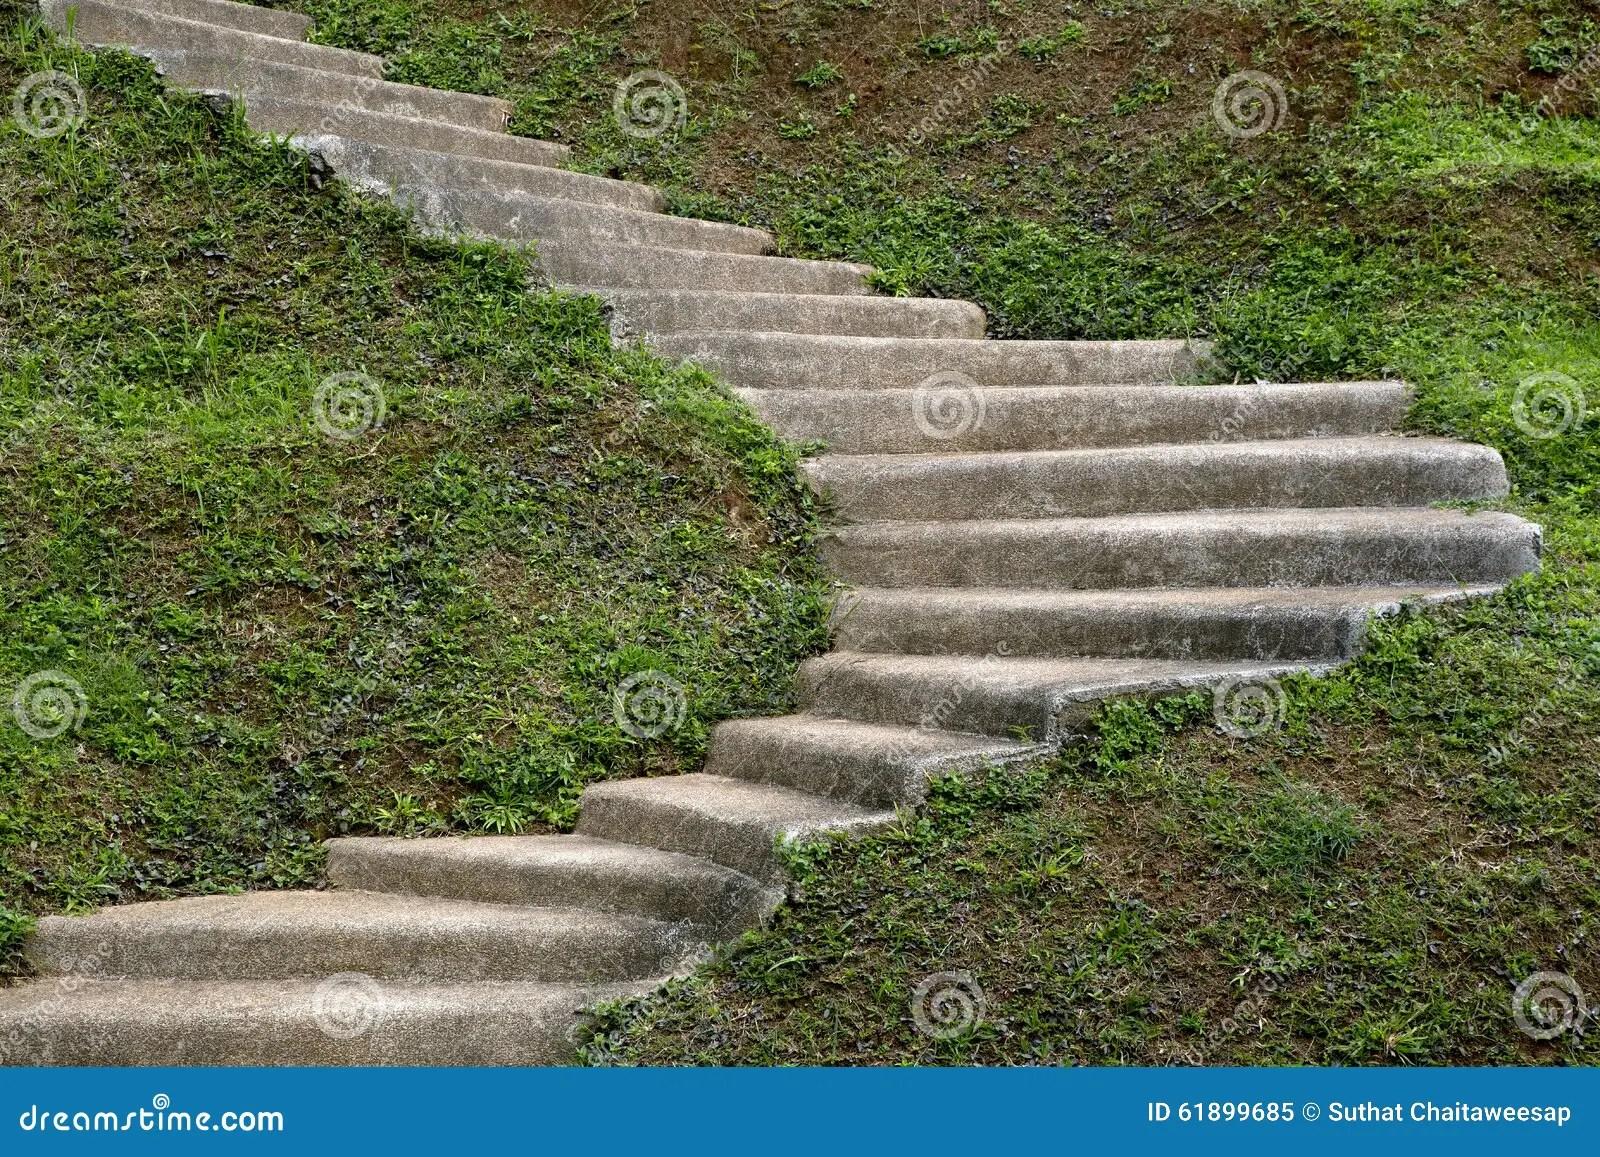 Escalier Naturel Dans Le Jardin | Un Bassin Naturel Dans Un Jardin ...